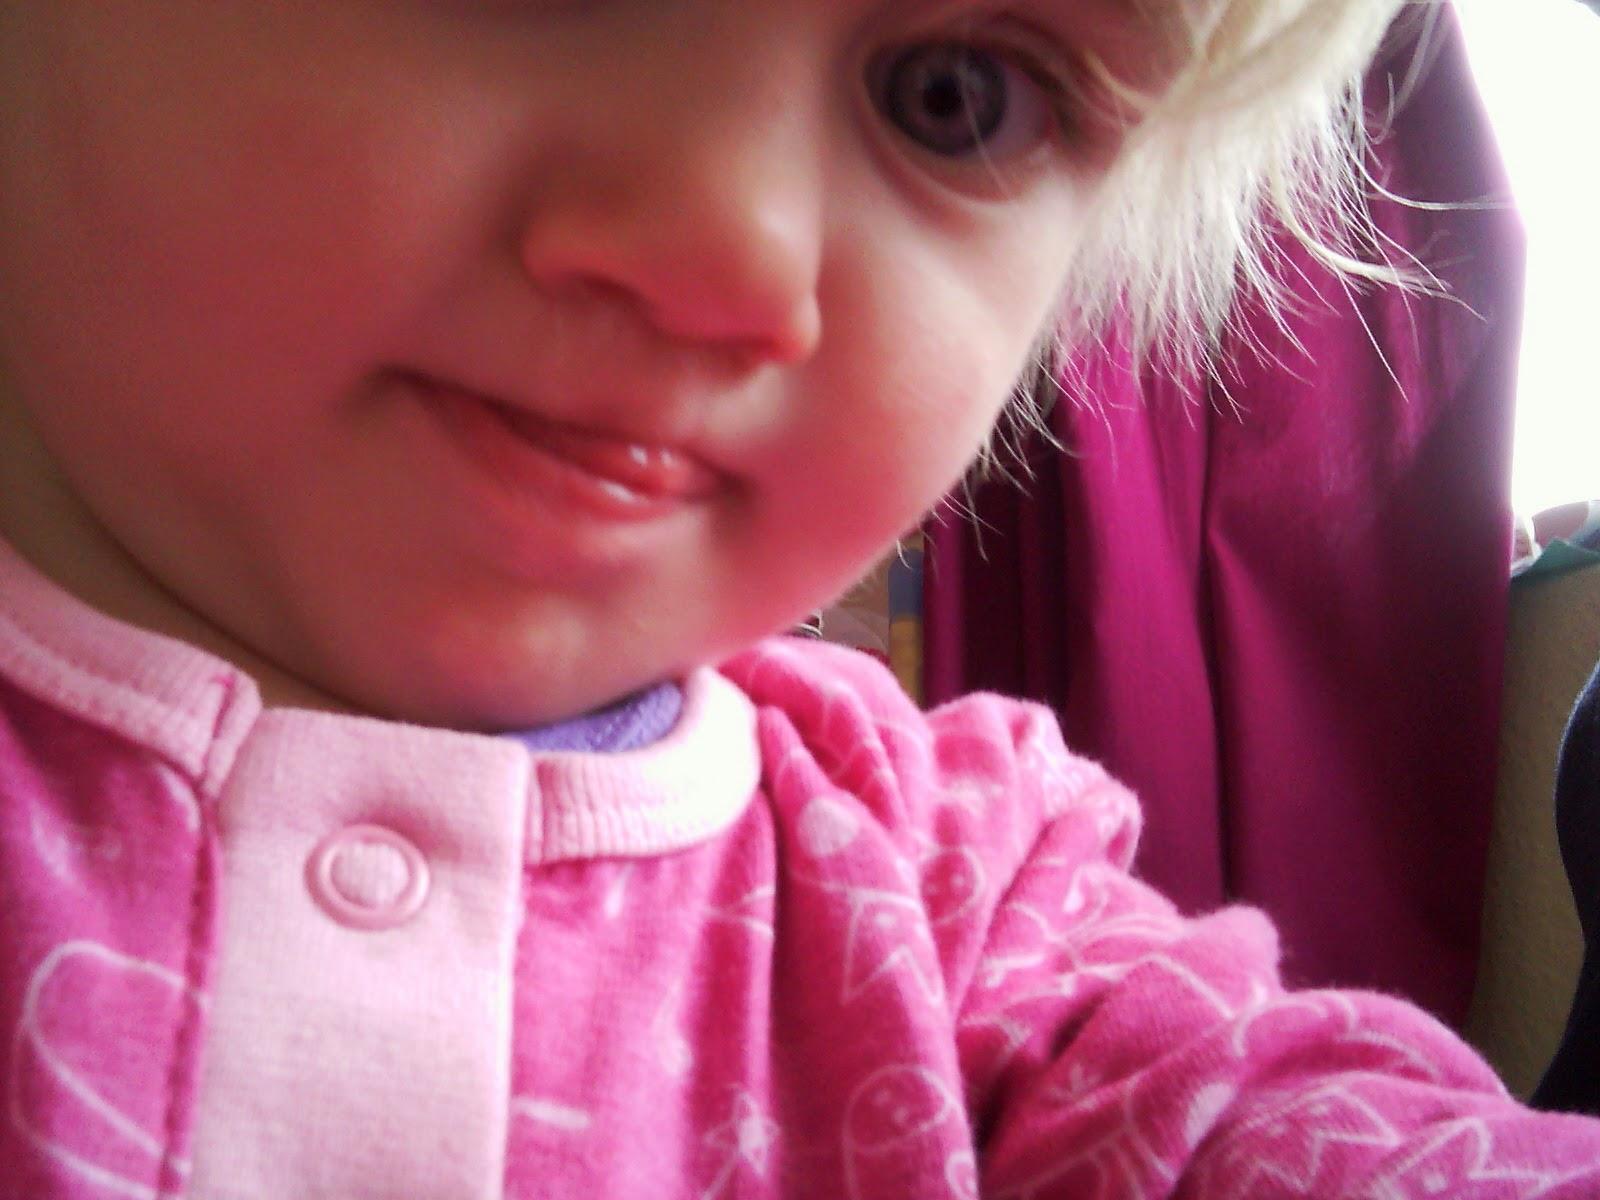 VTech Kiddizoom Twist Plus toddler takes selfie